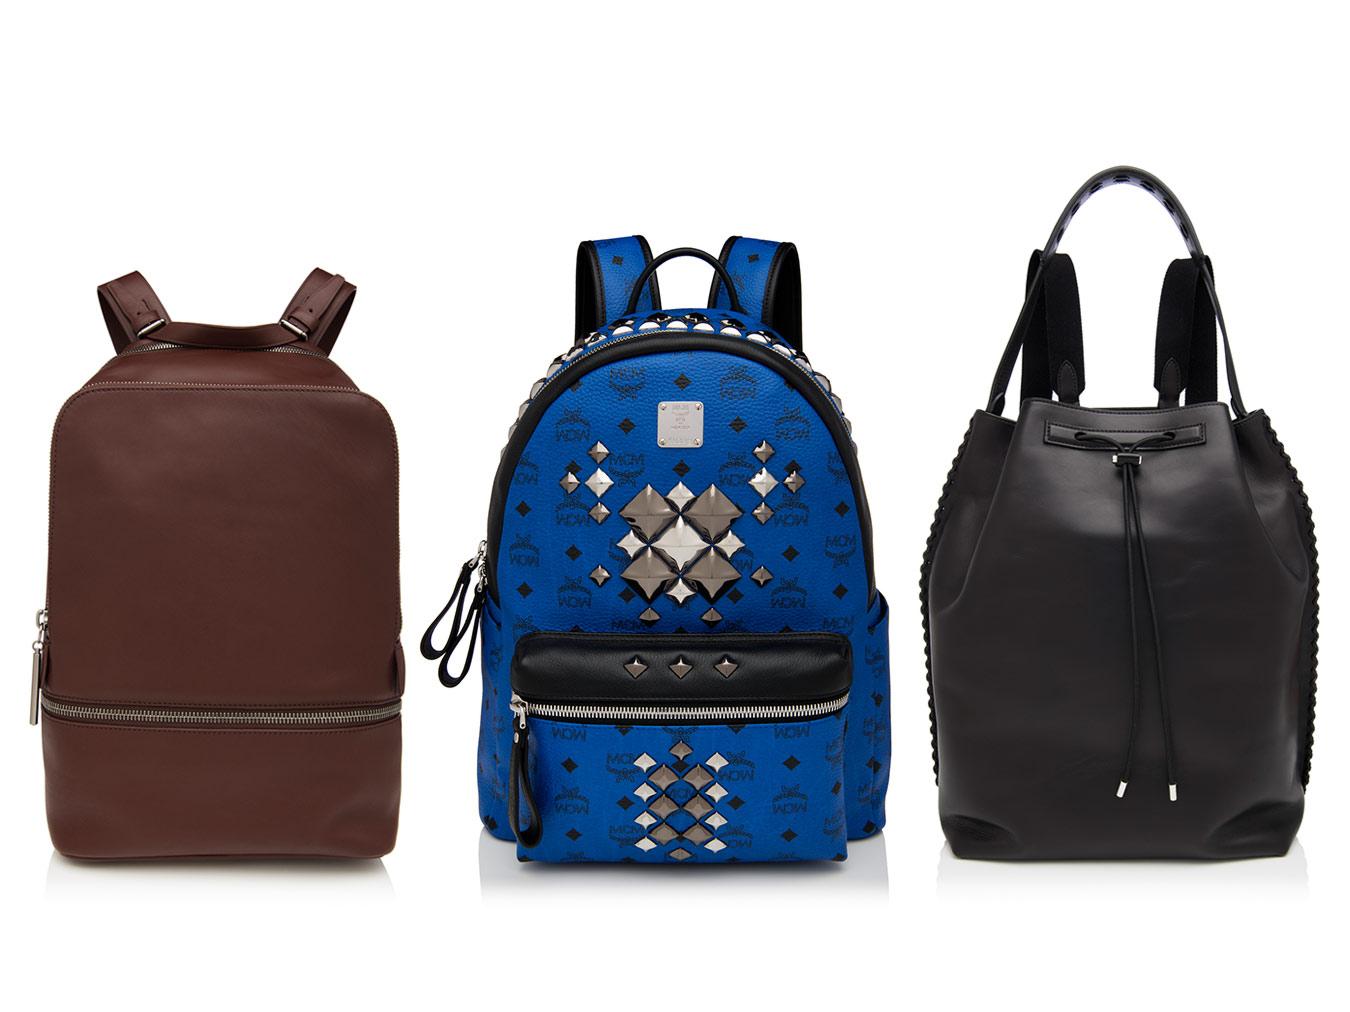 MONTECRISTO Blog: Backpacks